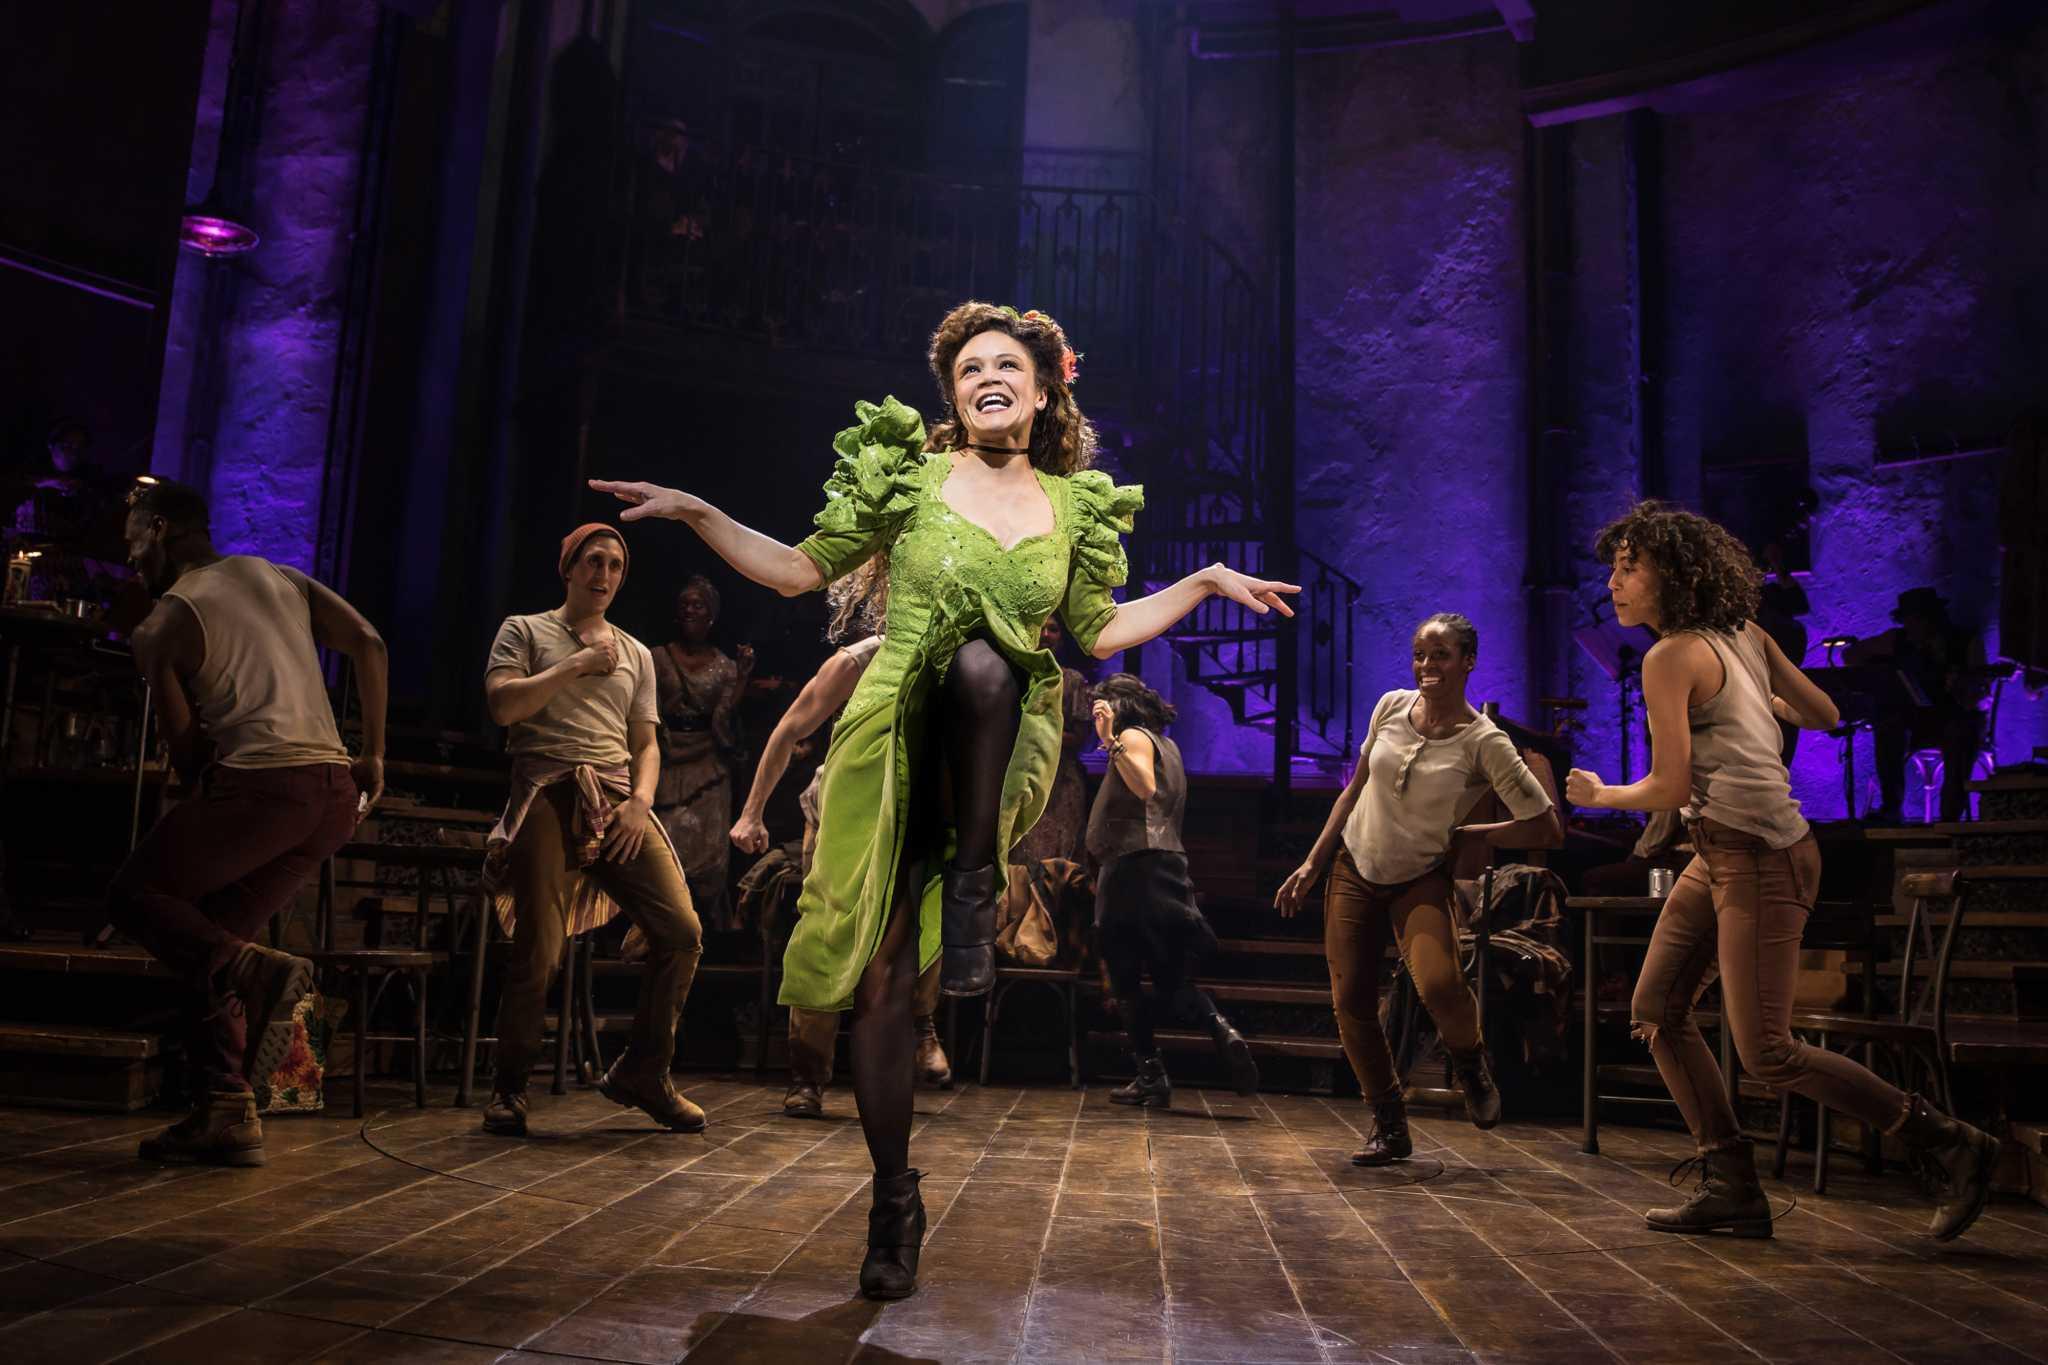 Kennedy Center plans massive season of in-person theater, including 'To Kill a Mockingbird,' 'Hamilton' and 'Hadestown'